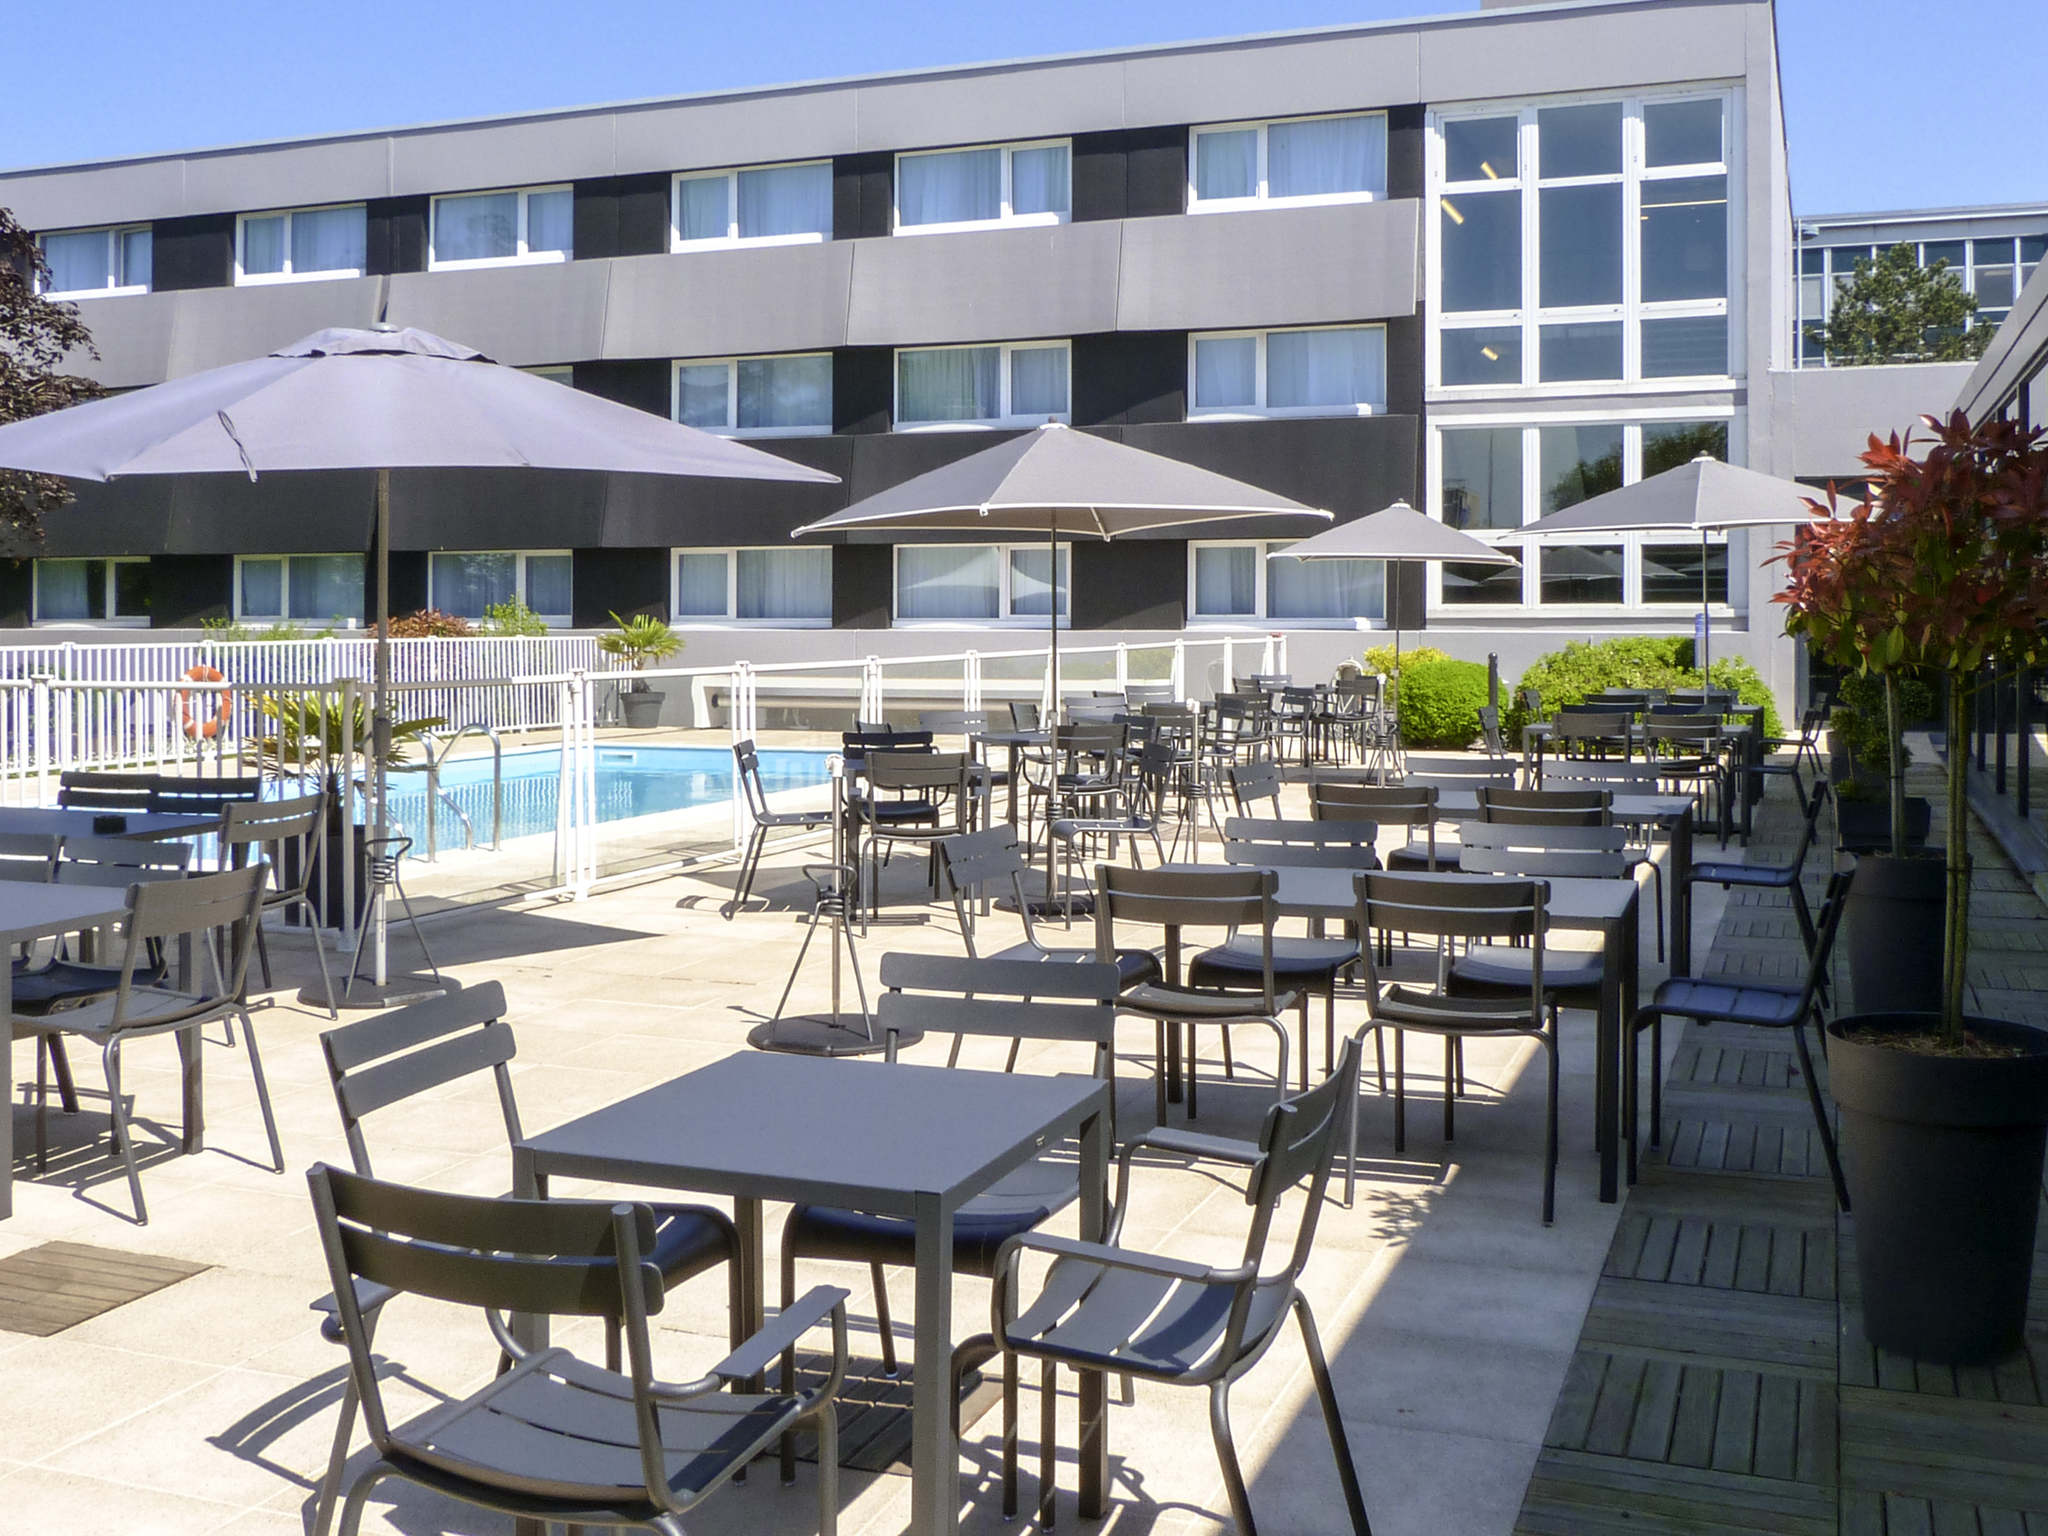 Hotel In Caen Novotel Caen Côte De Nacre